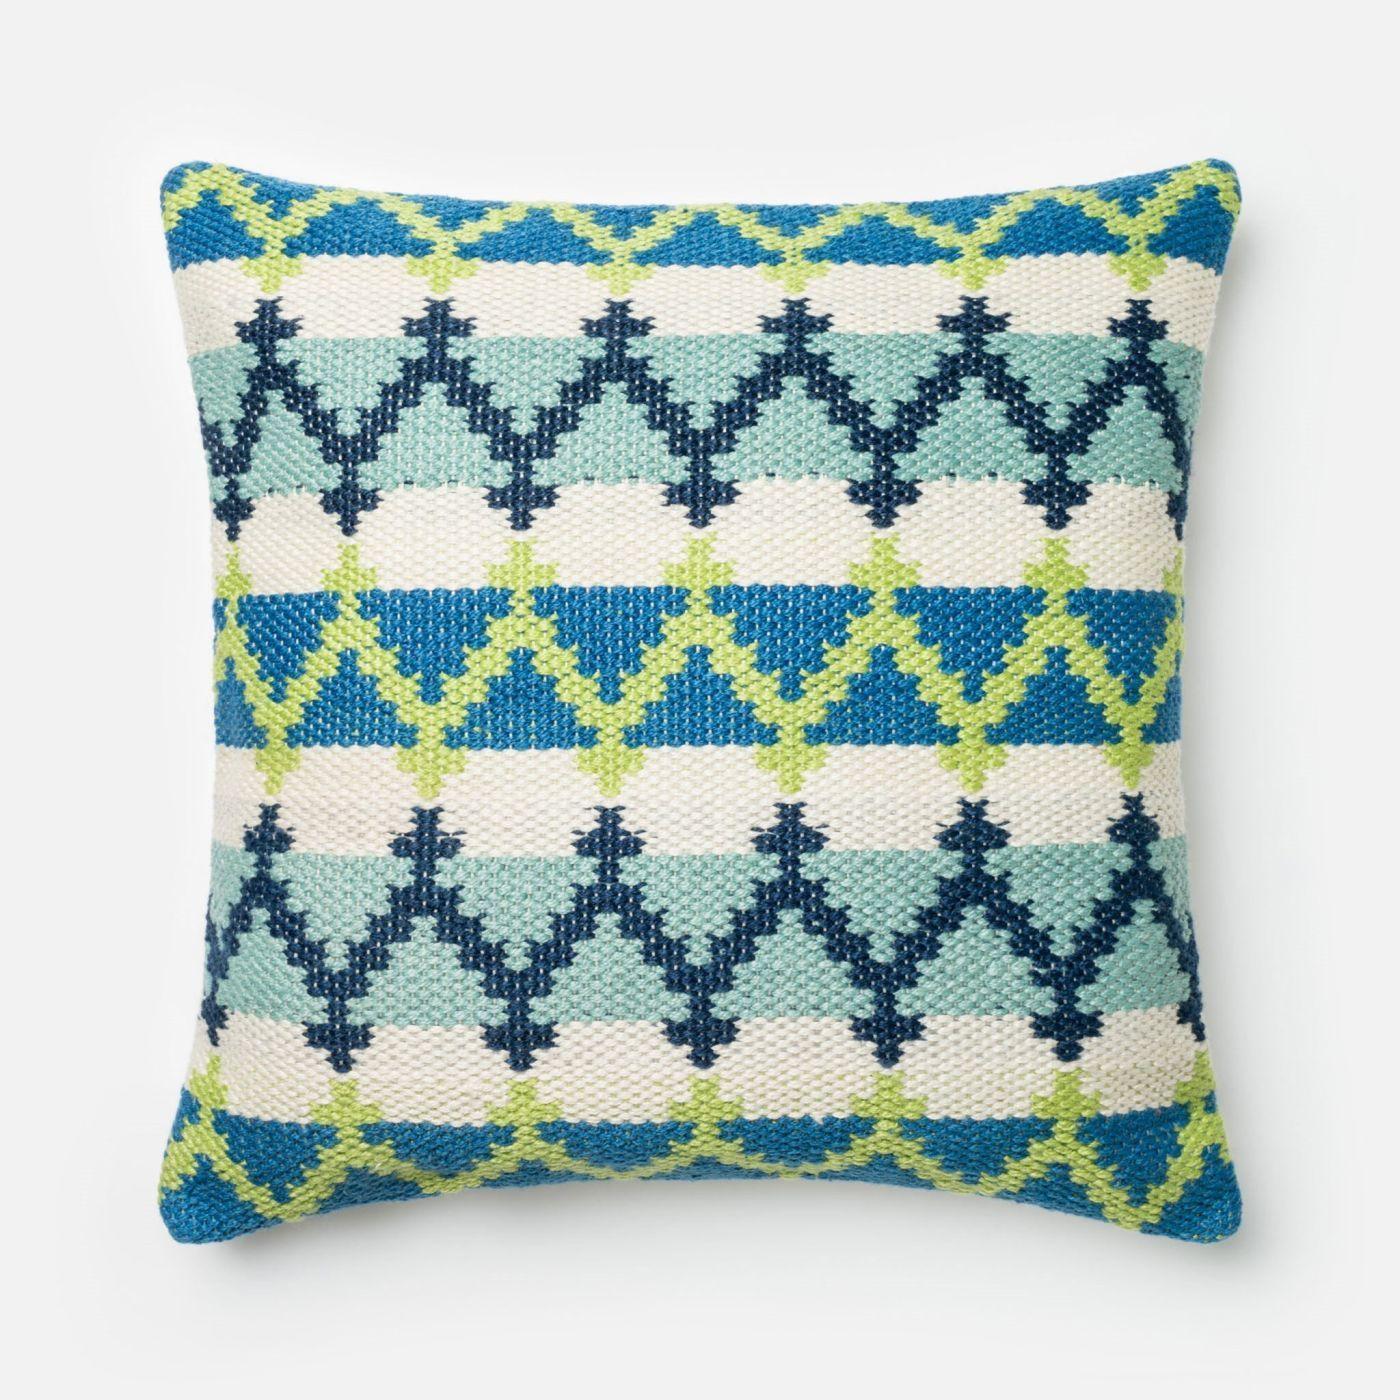 Loloi Blue Green Decorative Throw Pillow P0340